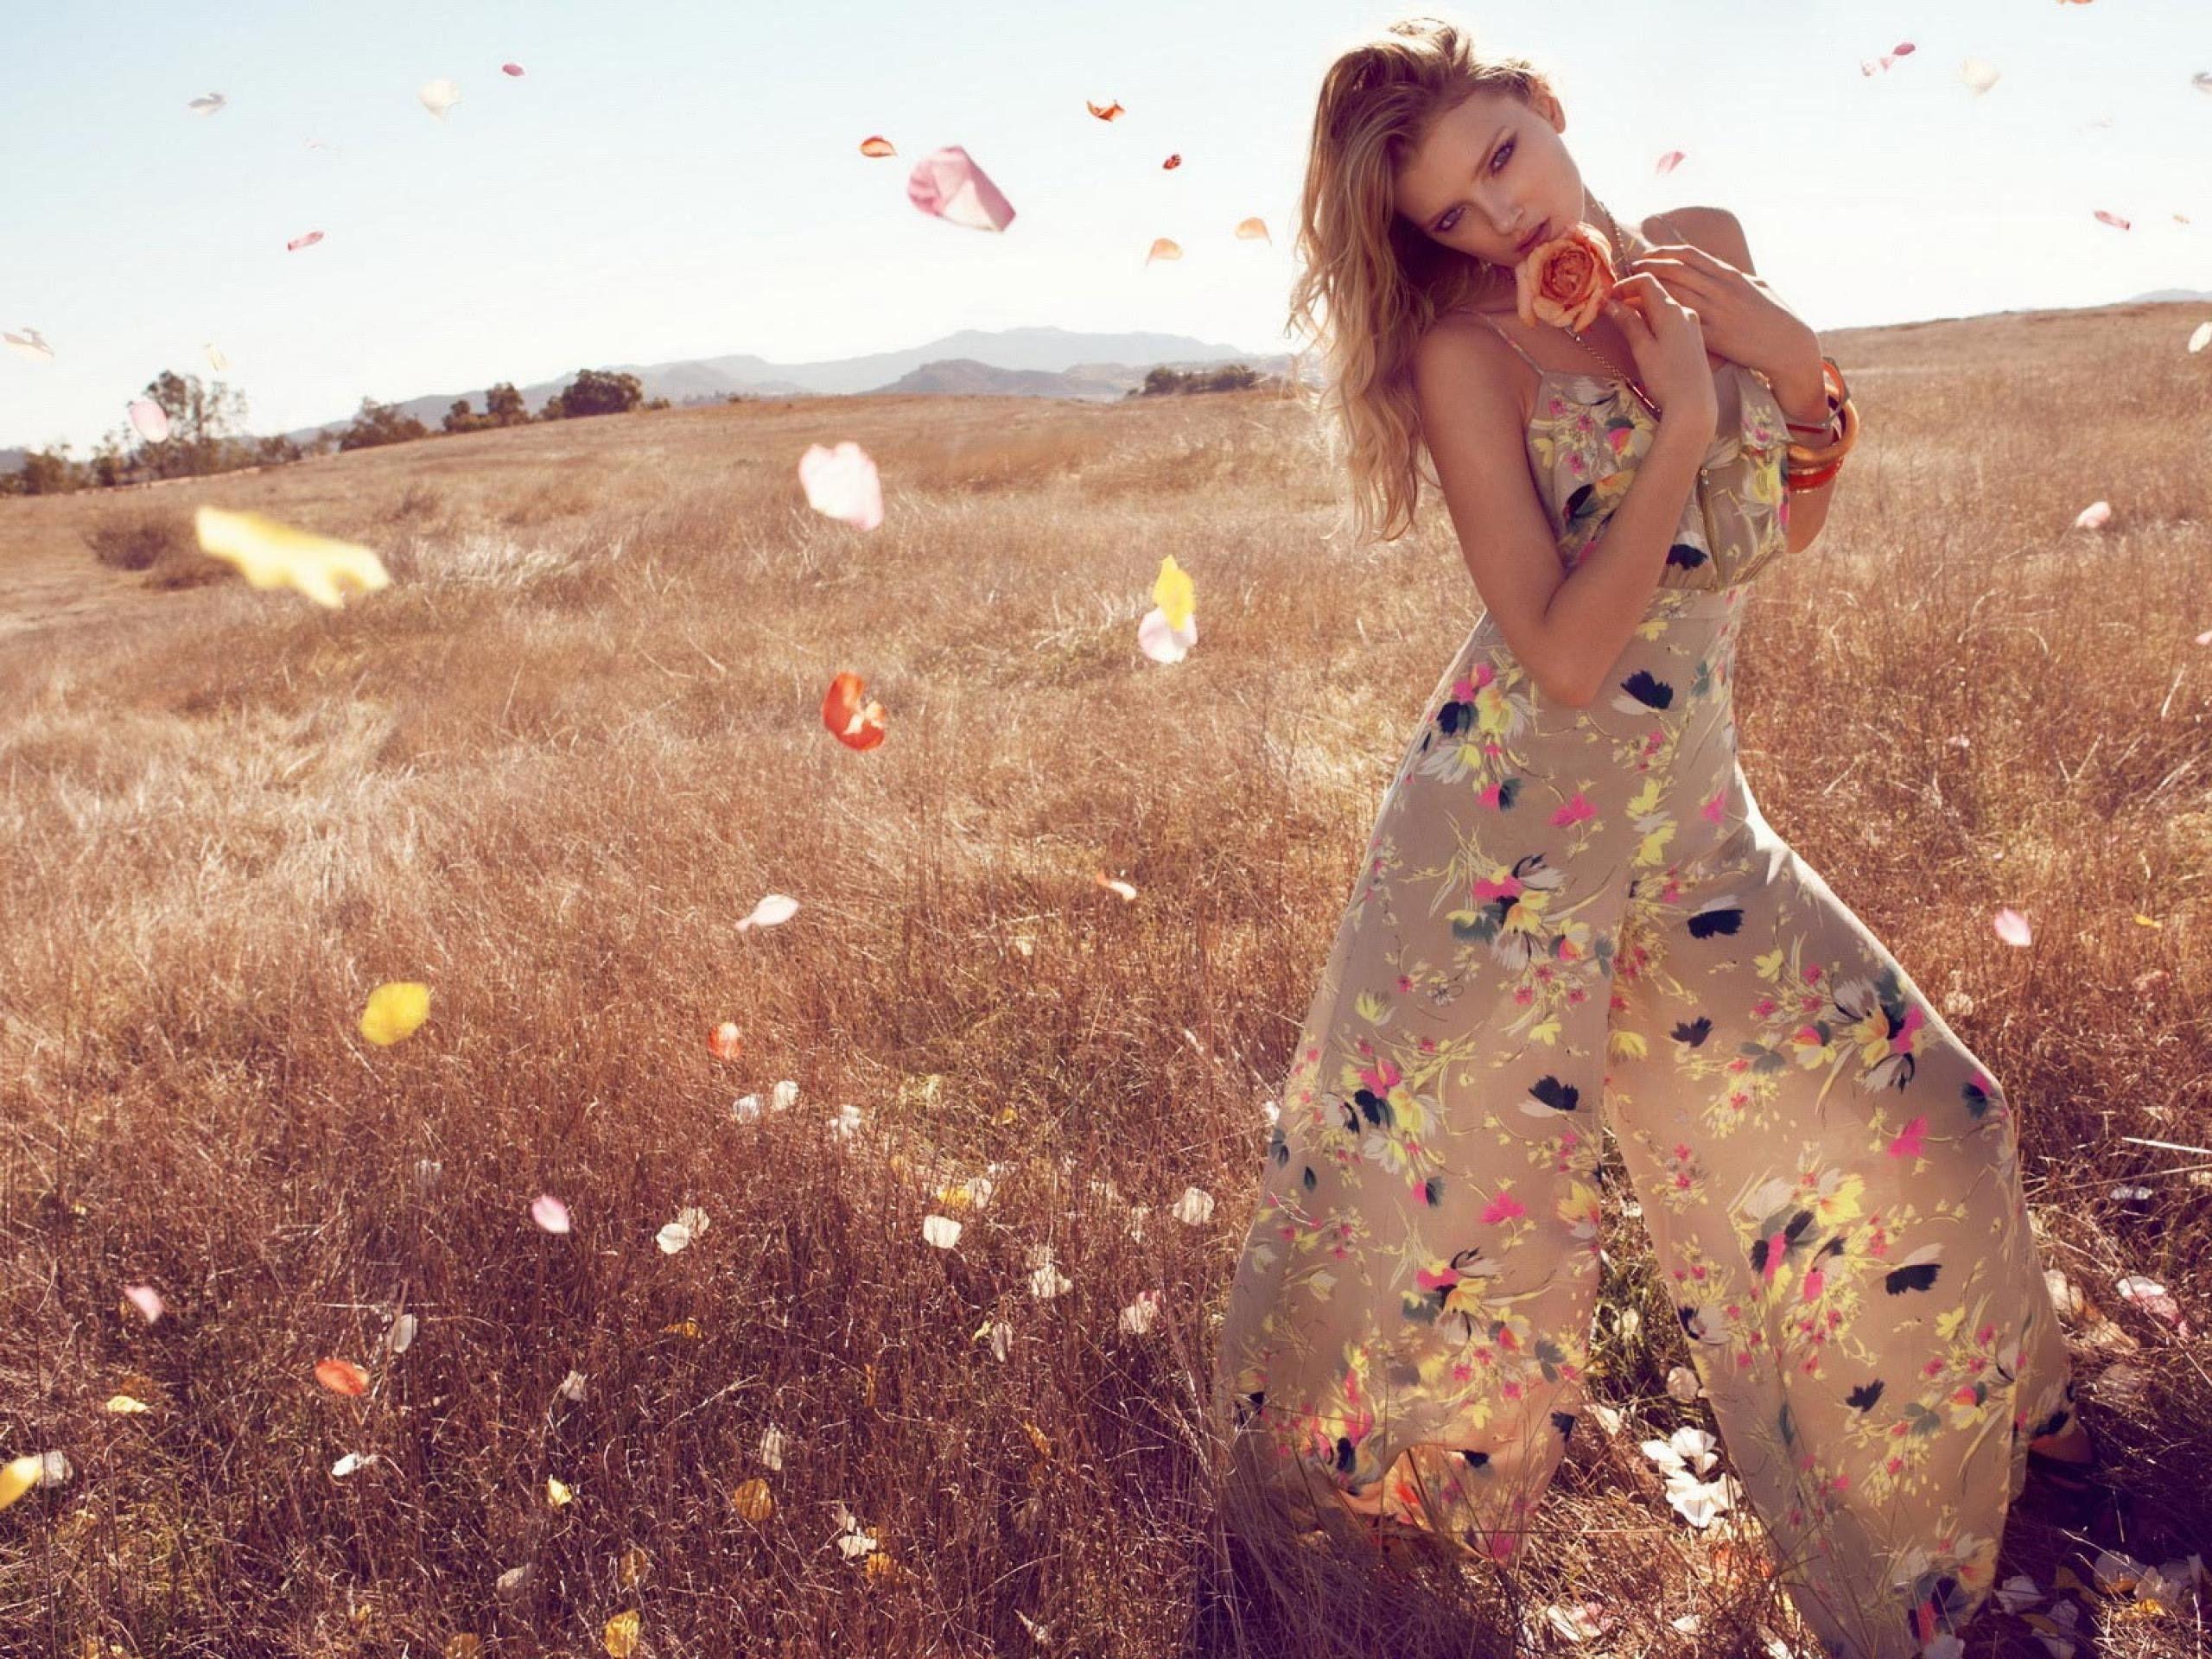 blondes-women-nature-model-photography.jpg (2560×1920)